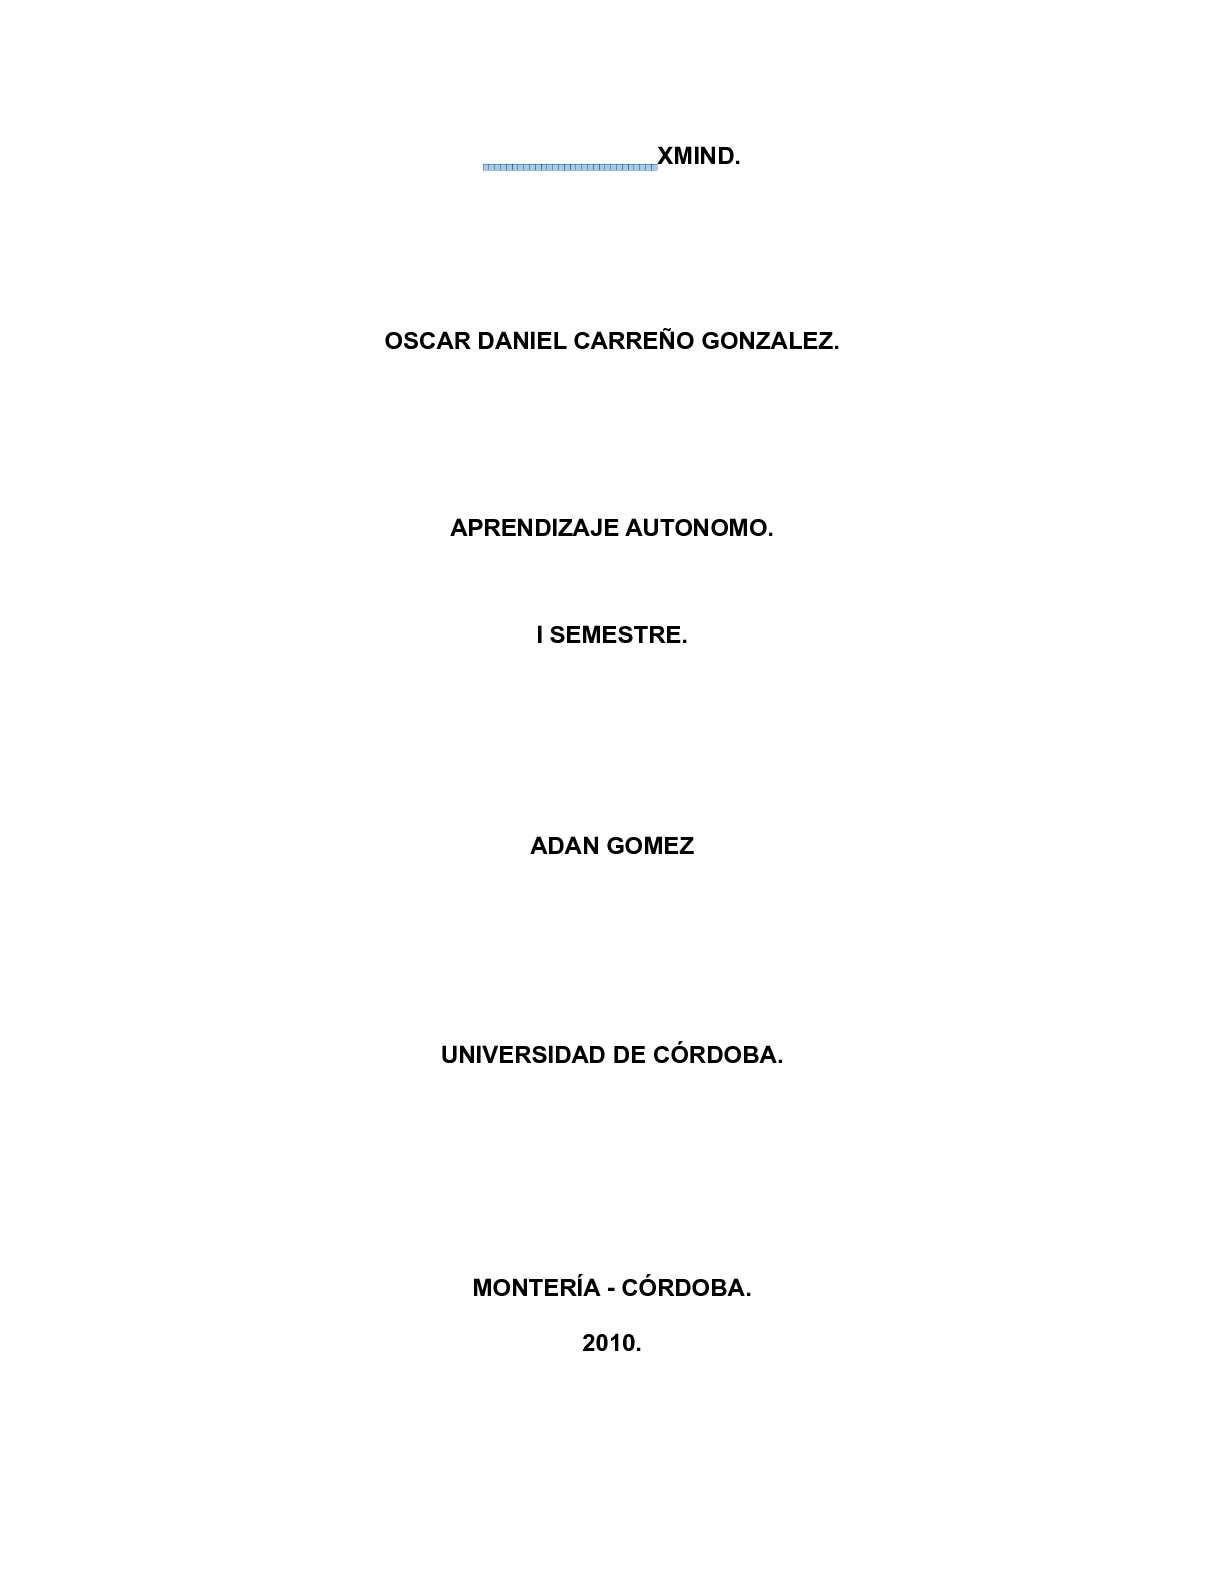 Calaméo - XMIND - OSCAR DANIEL CARREÑO GONZALEZ